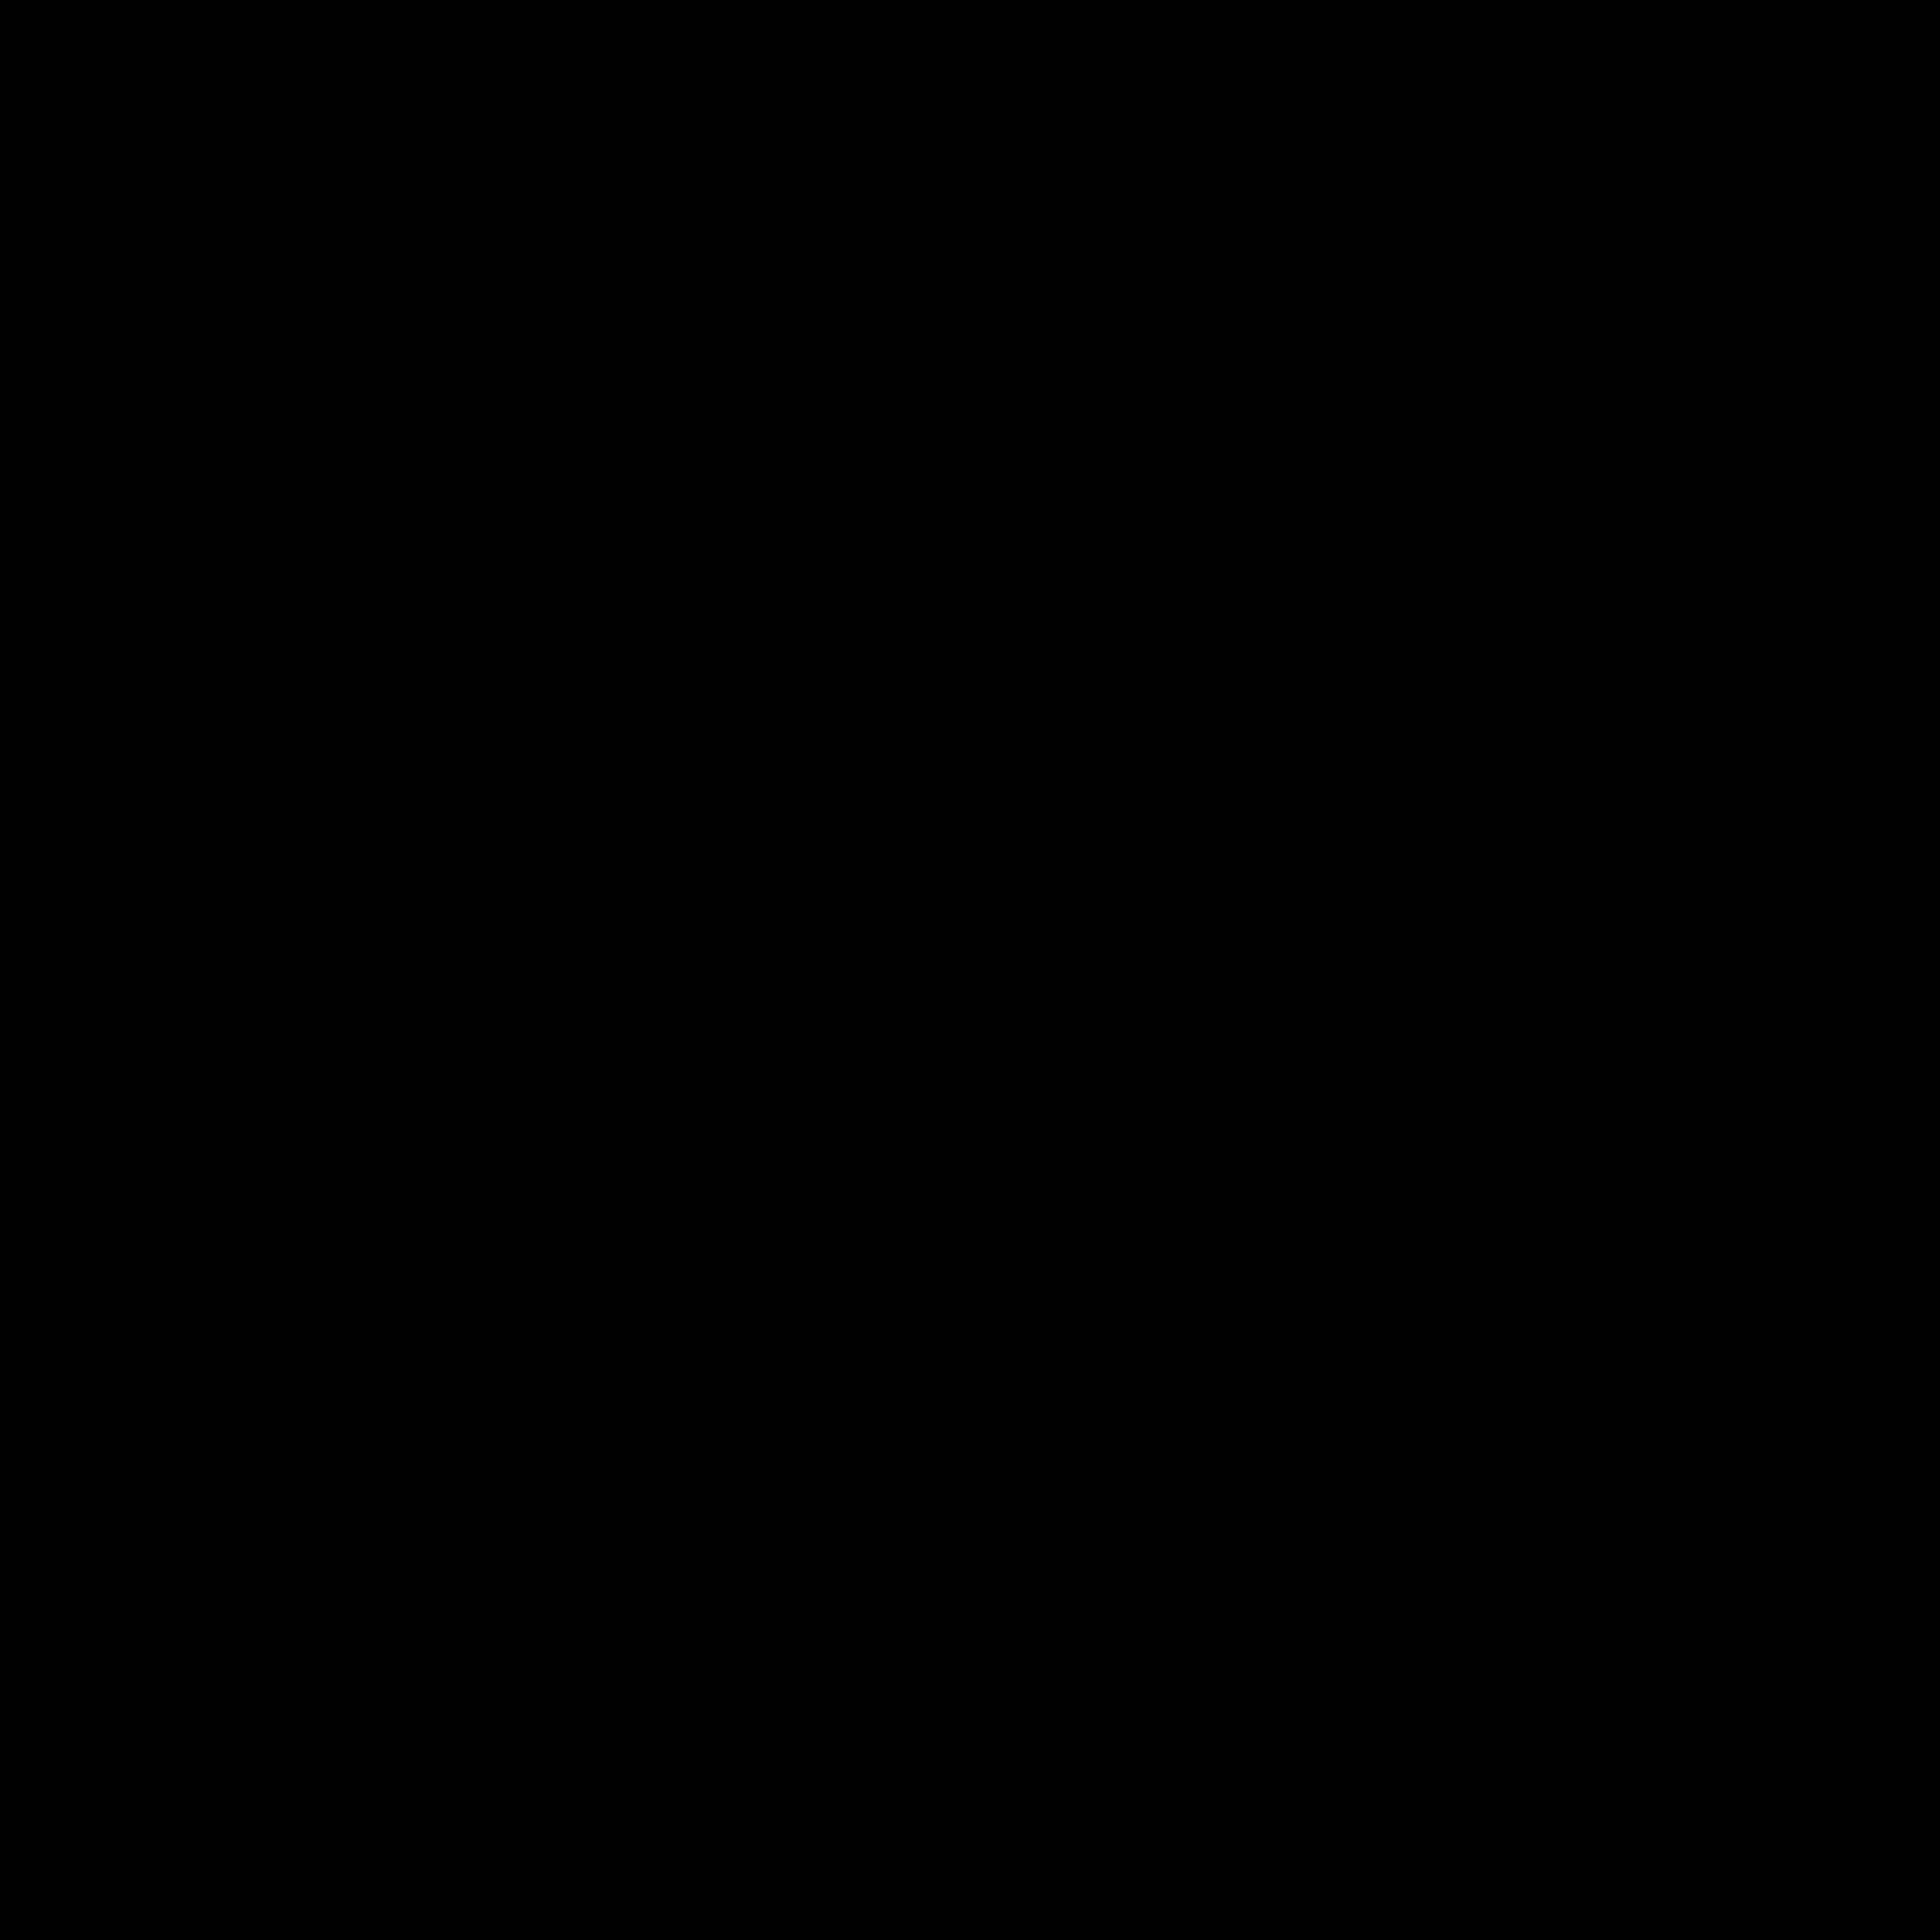 S16FG Dimensions